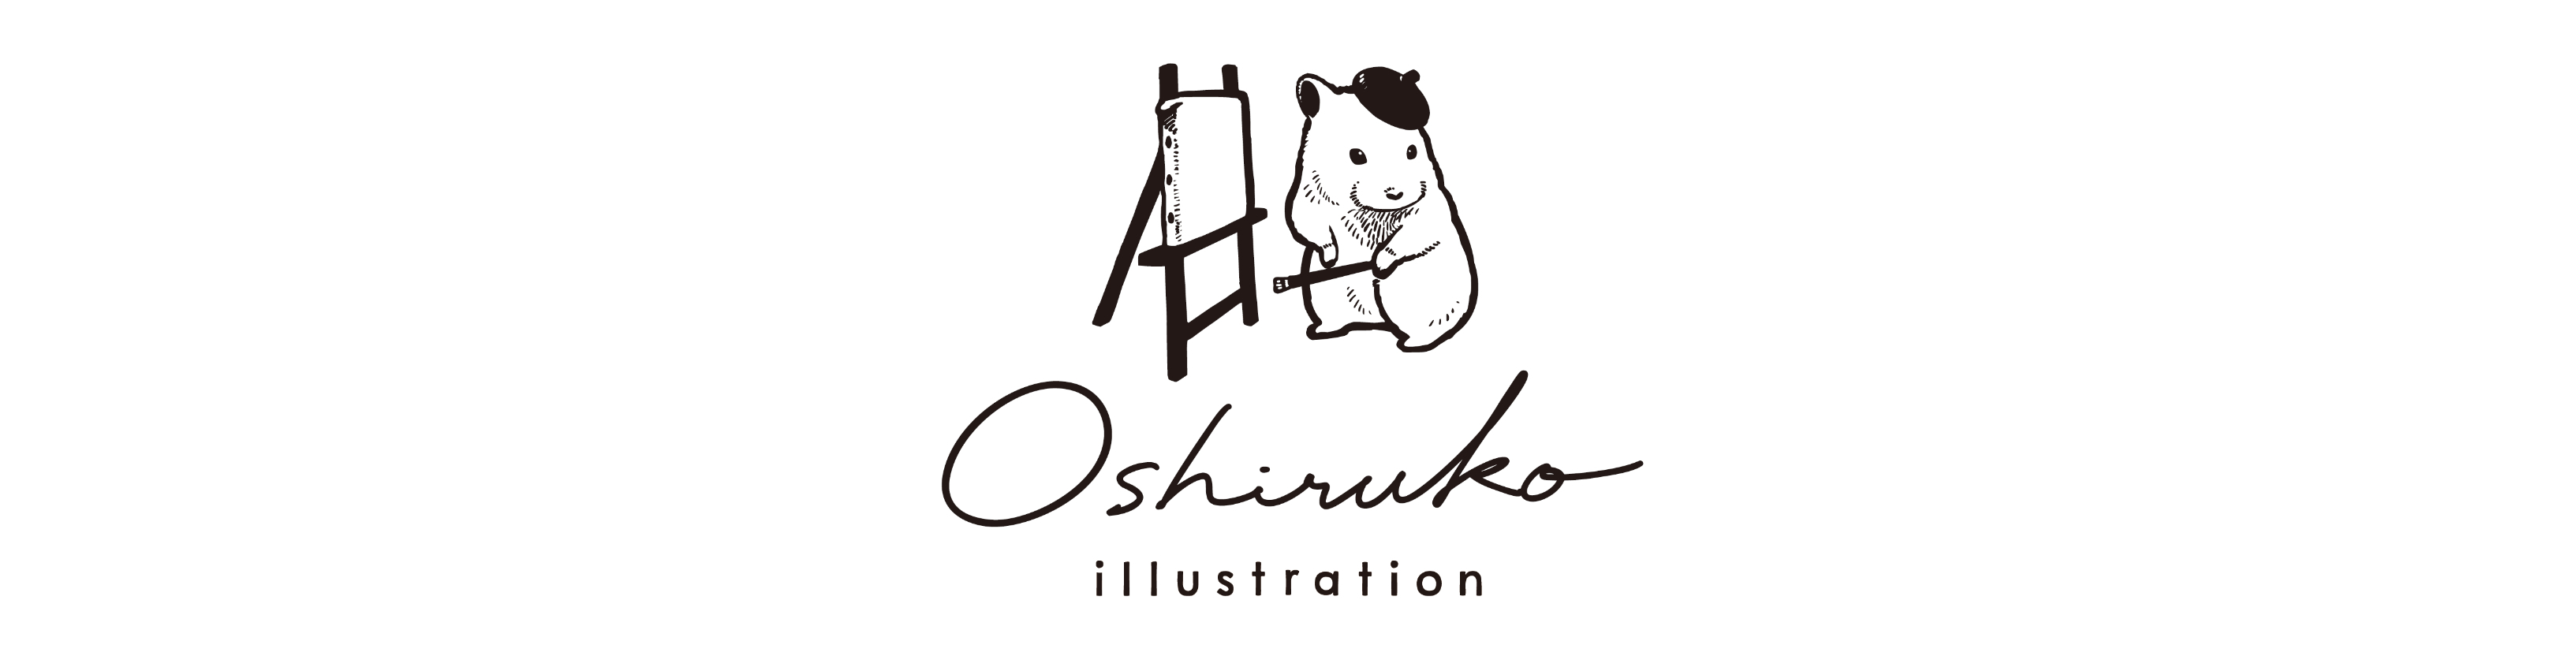 Oshiruko illustration